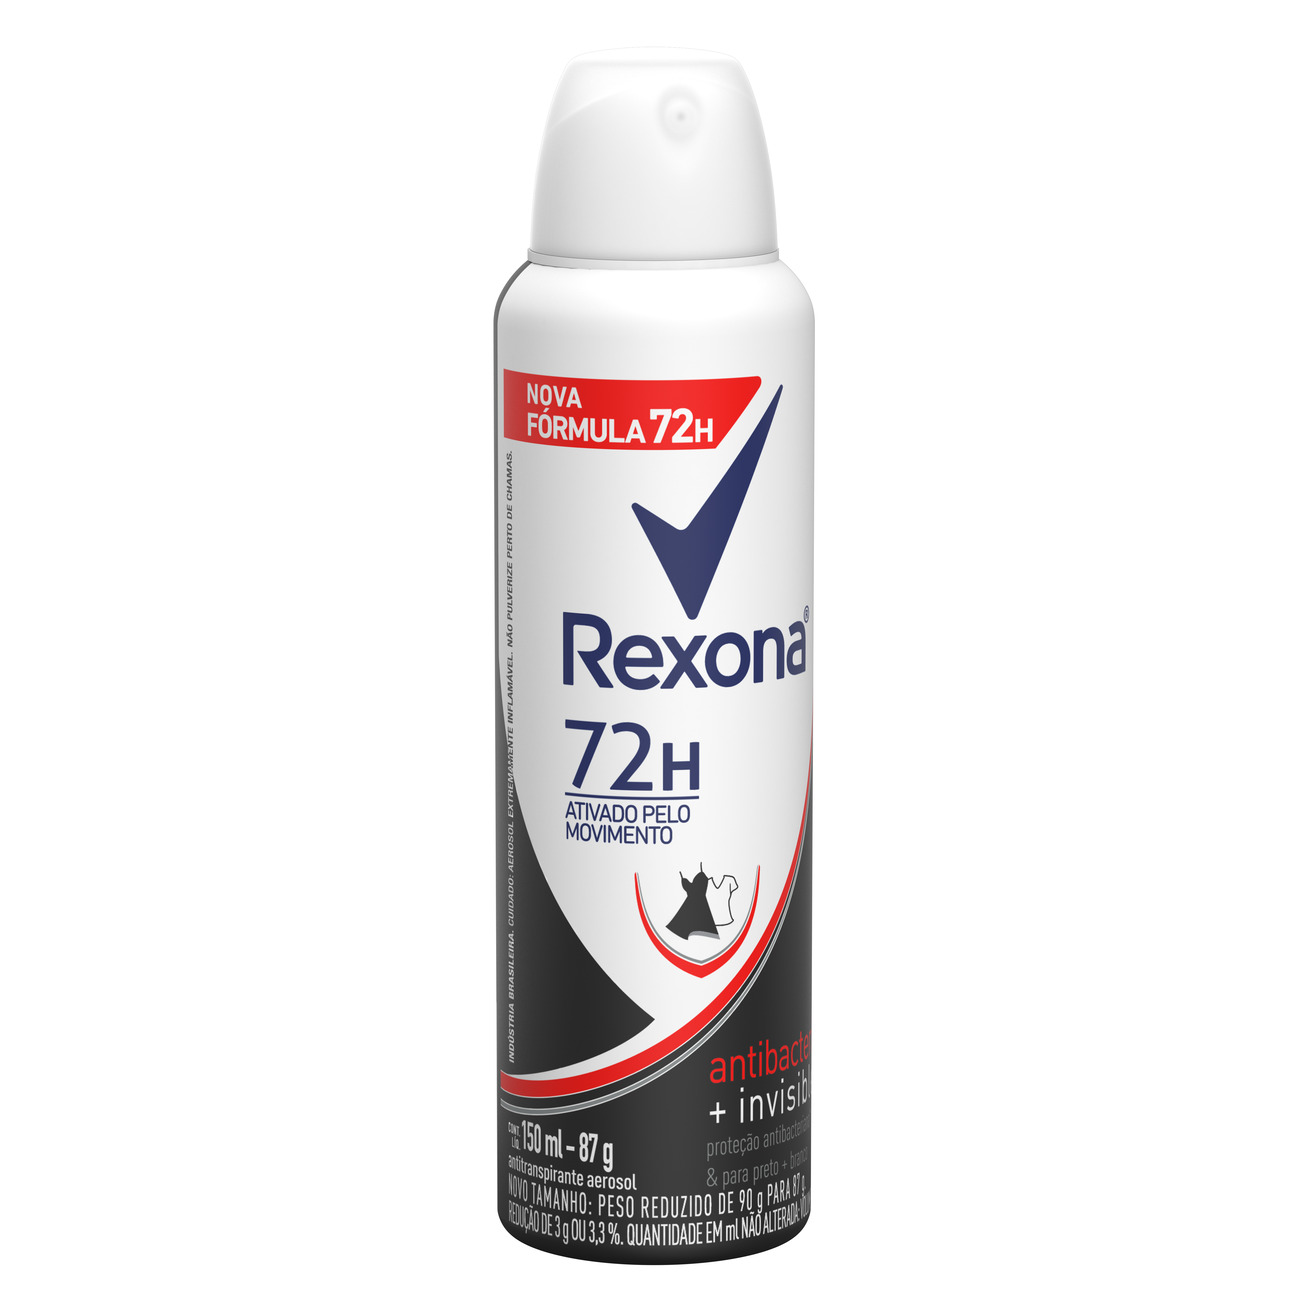 Desodorante Antitranspirante Rexona Aerosol Feminino  Antibacteriano + Invisible 72 horas 150mL